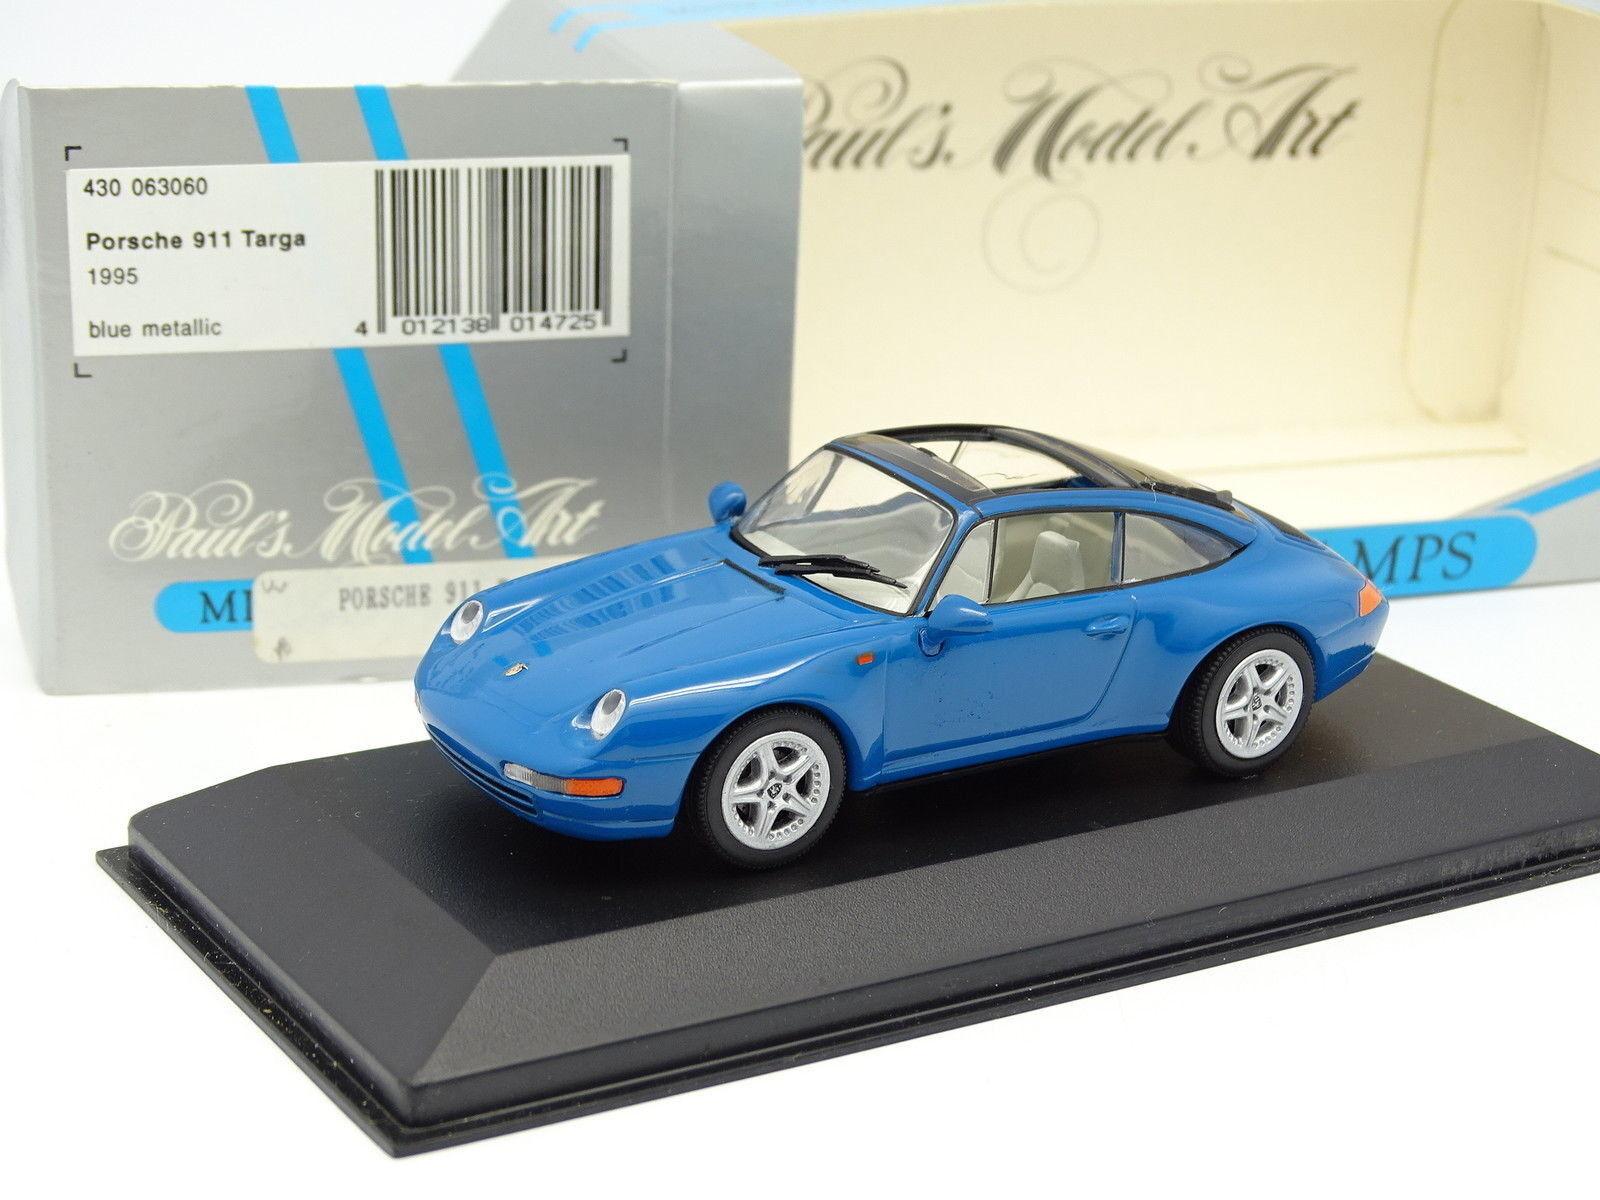 Minichamps 1 43 - Porsche 911 993 Targa 1995 Bleue